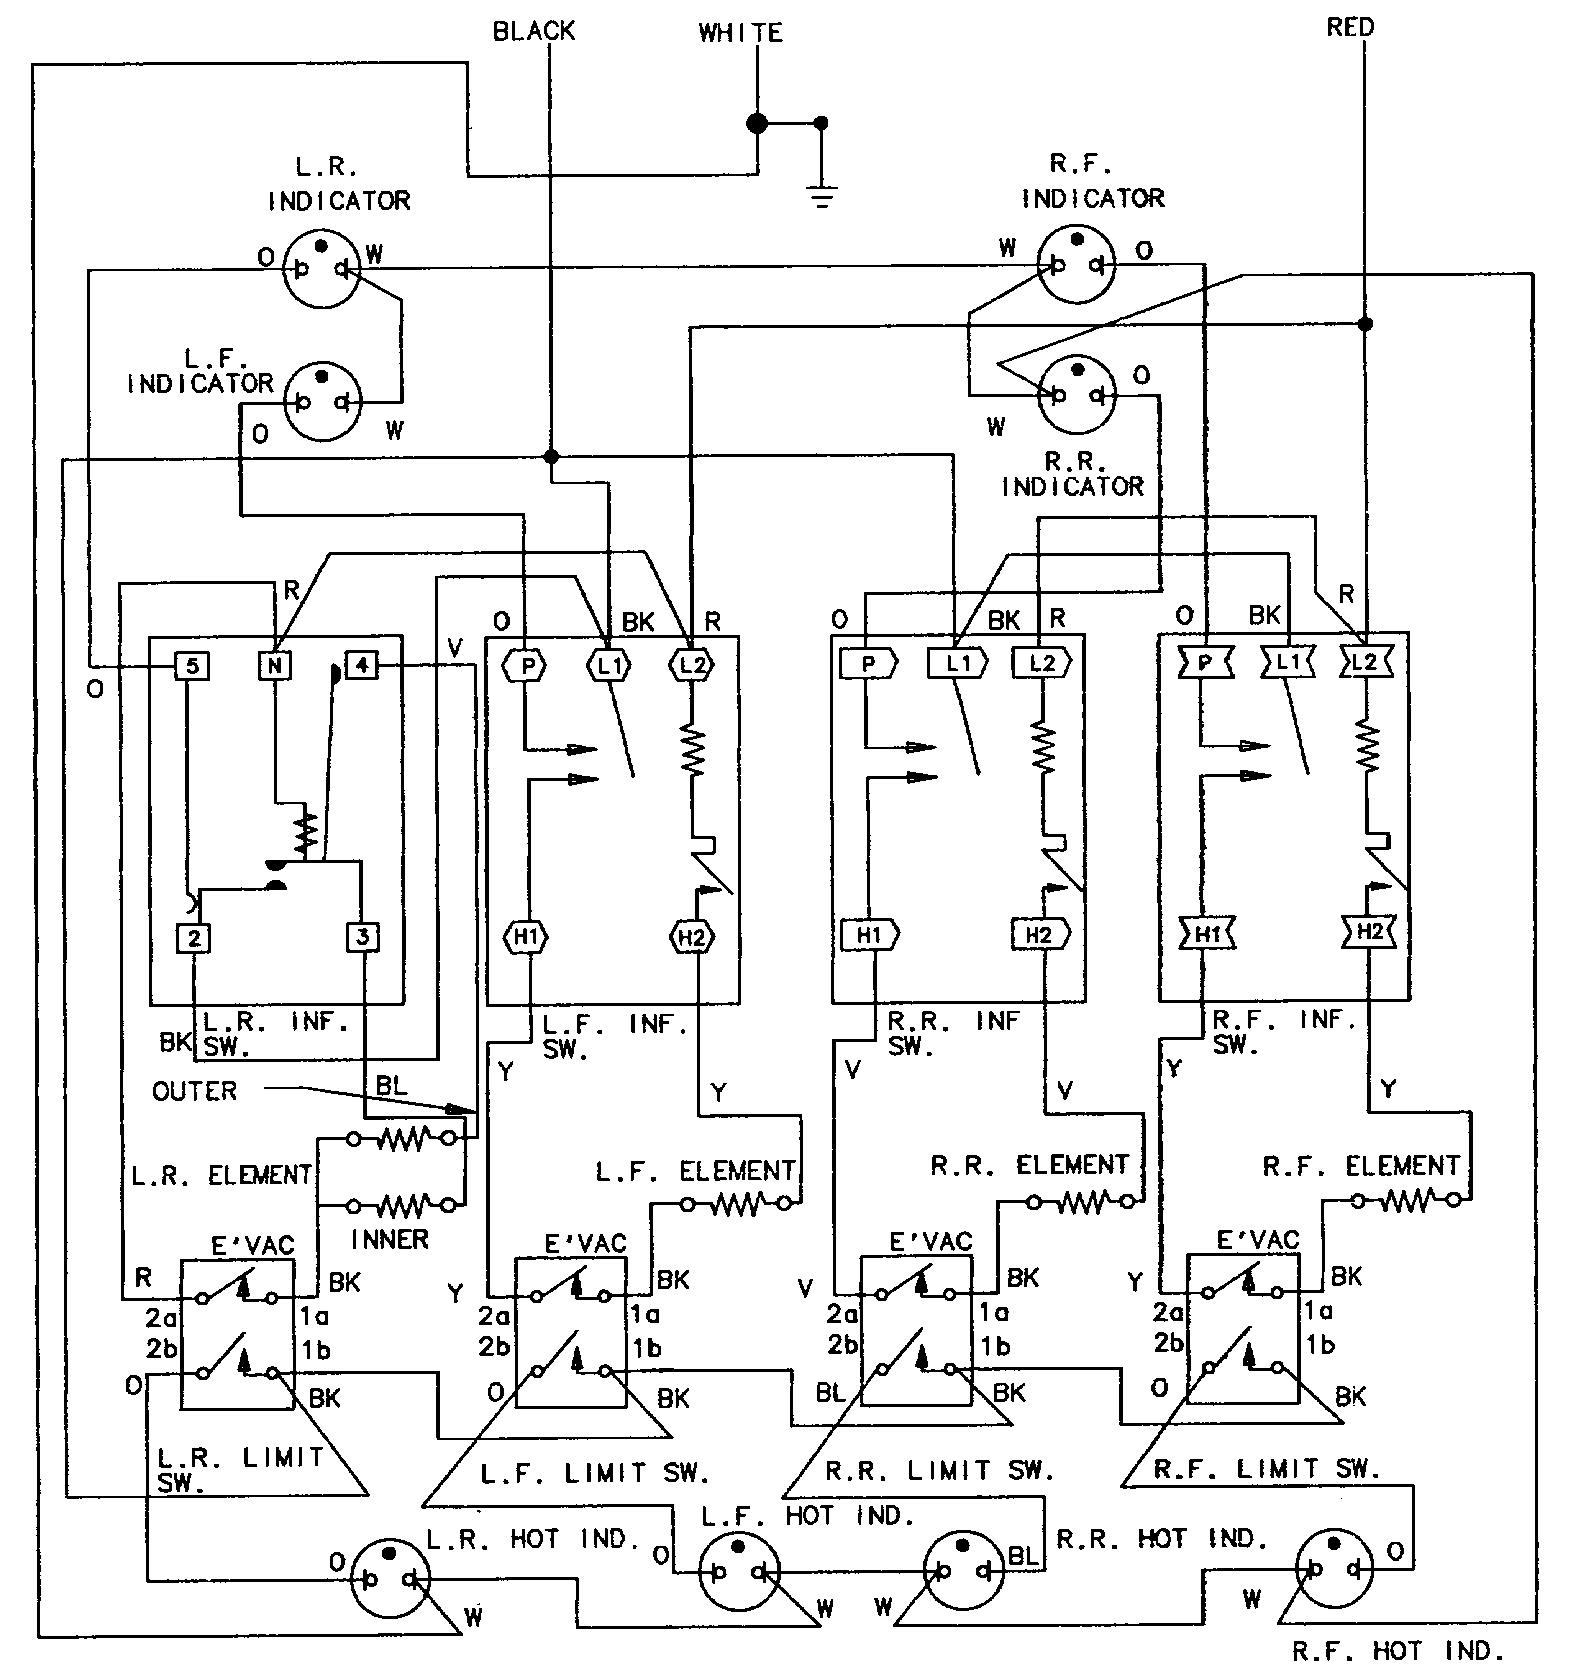 hight resolution of jenn air wiring diagram jenn air wiring diagram wiring diagram megajenn air wiring diagram wiring diagram